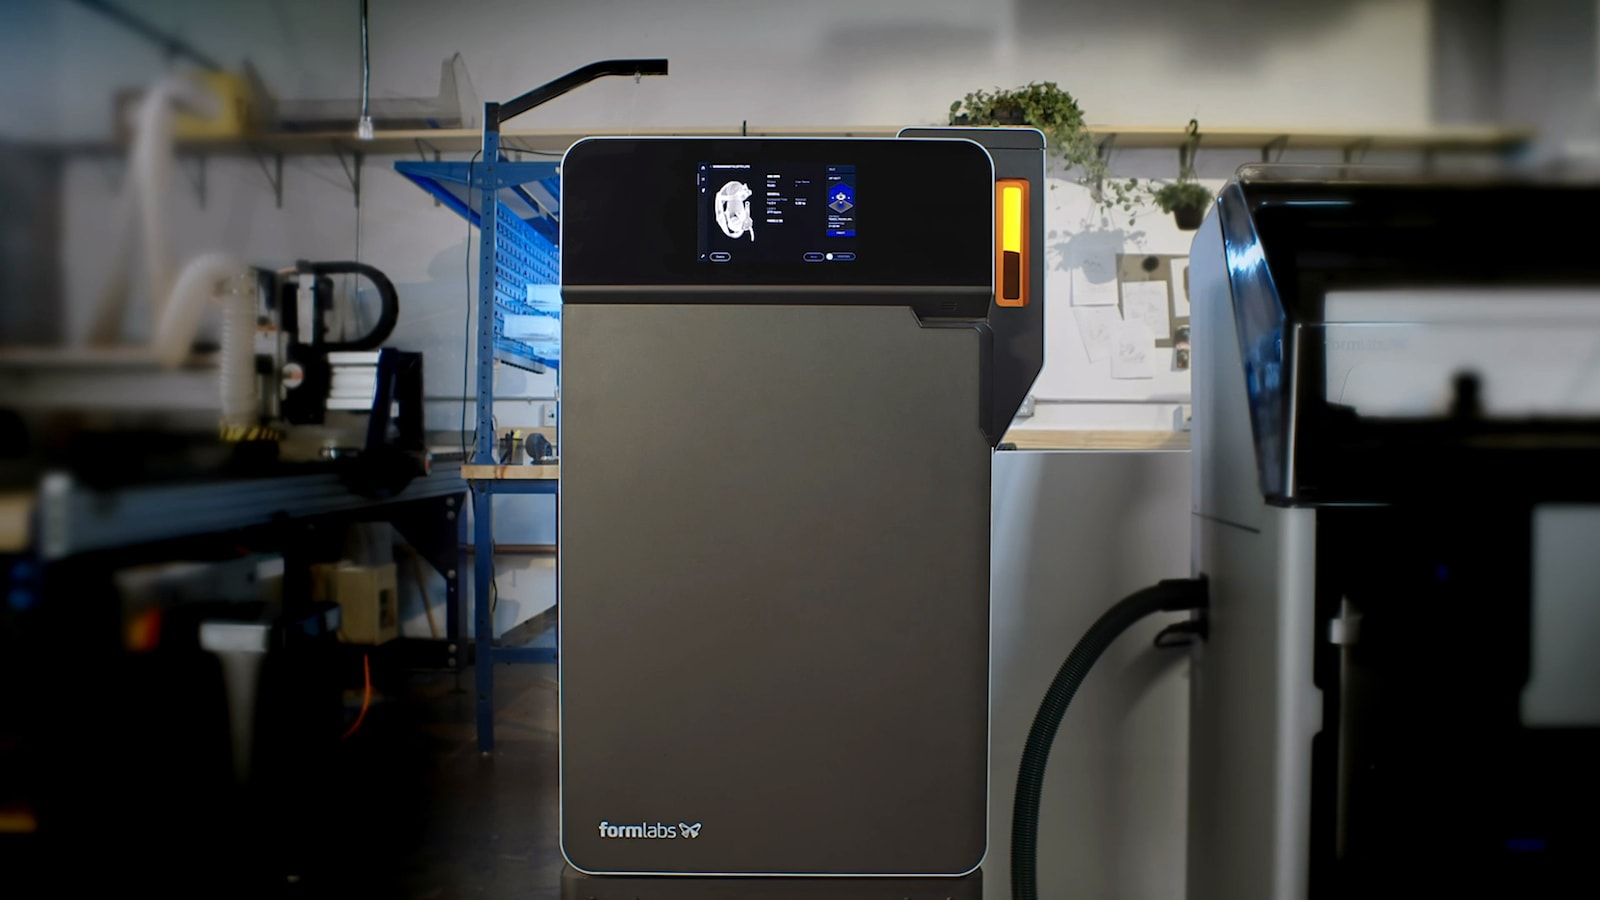 Formlabs Fuse 1 SLS 3D printer boasts a 70% powder refresh rate